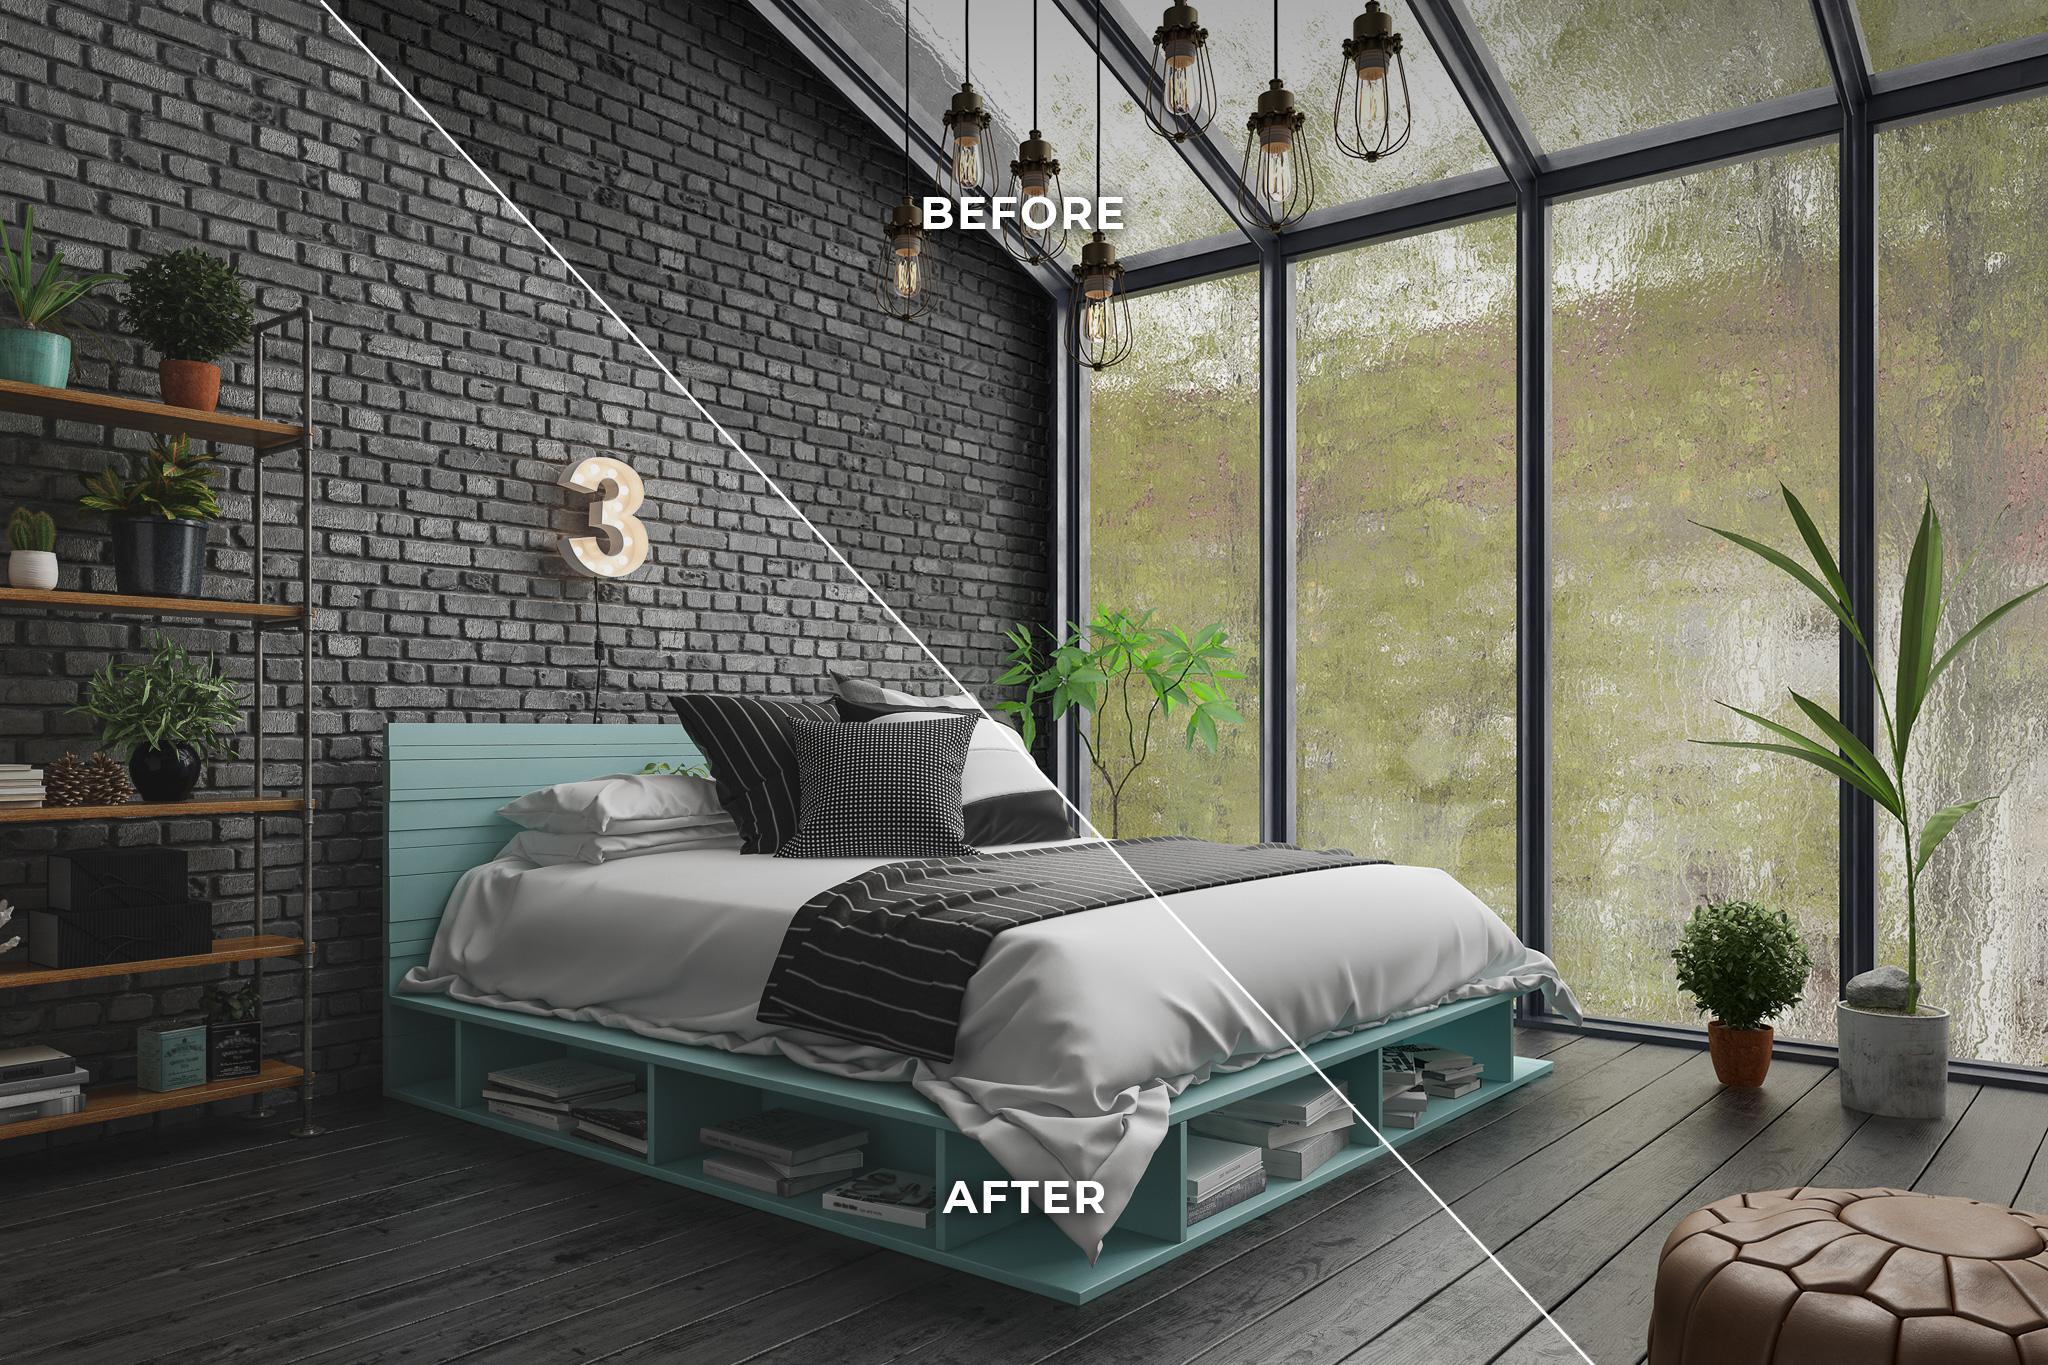 Photo Retouching Bedroom